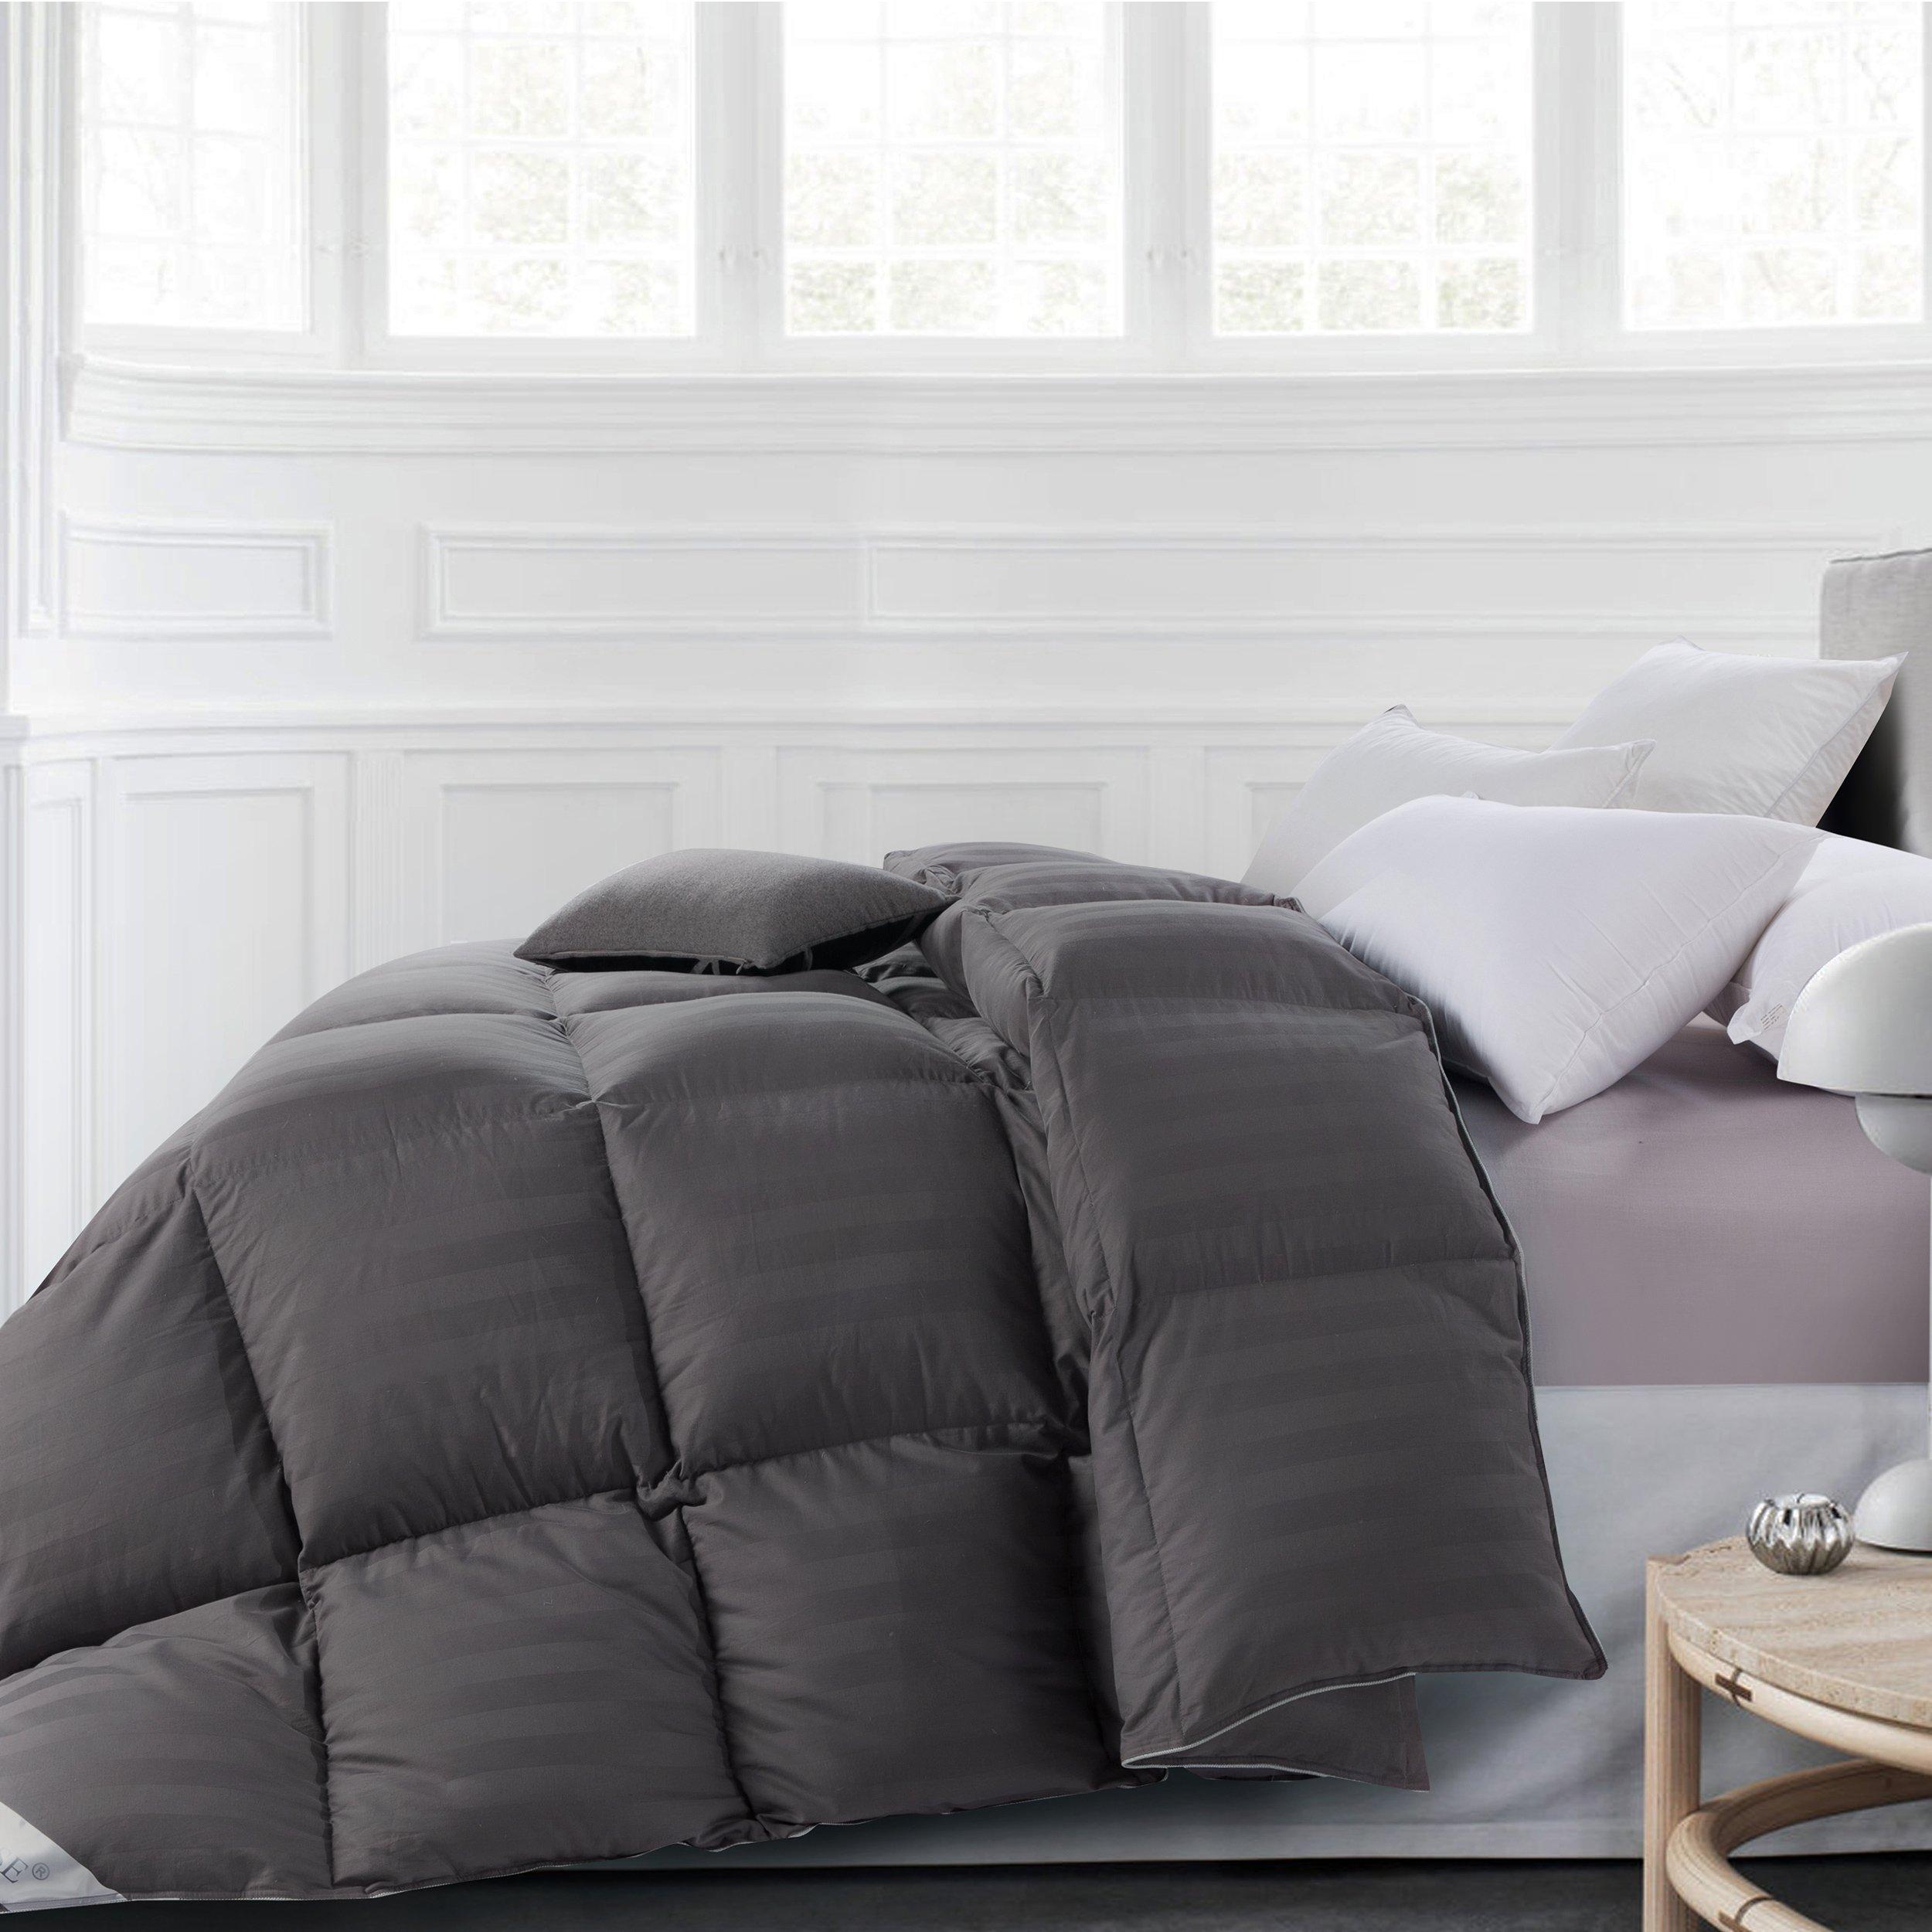 rosecose luxurious all seasons goose down comforter king size duvet insert gray 797566089630 ebay. Black Bedroom Furniture Sets. Home Design Ideas